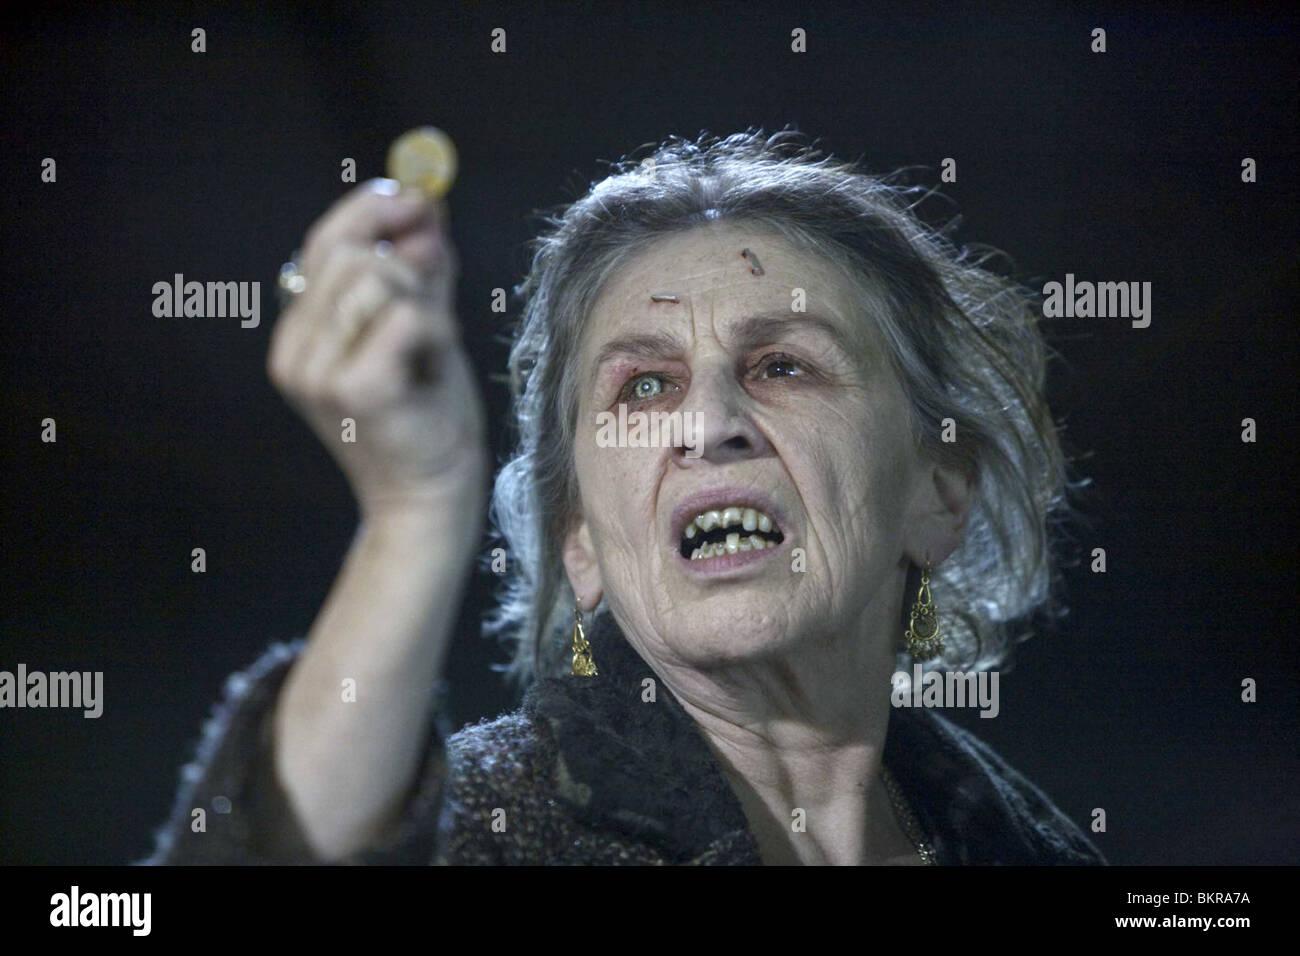 Jennica Garcia (b. 1989) images